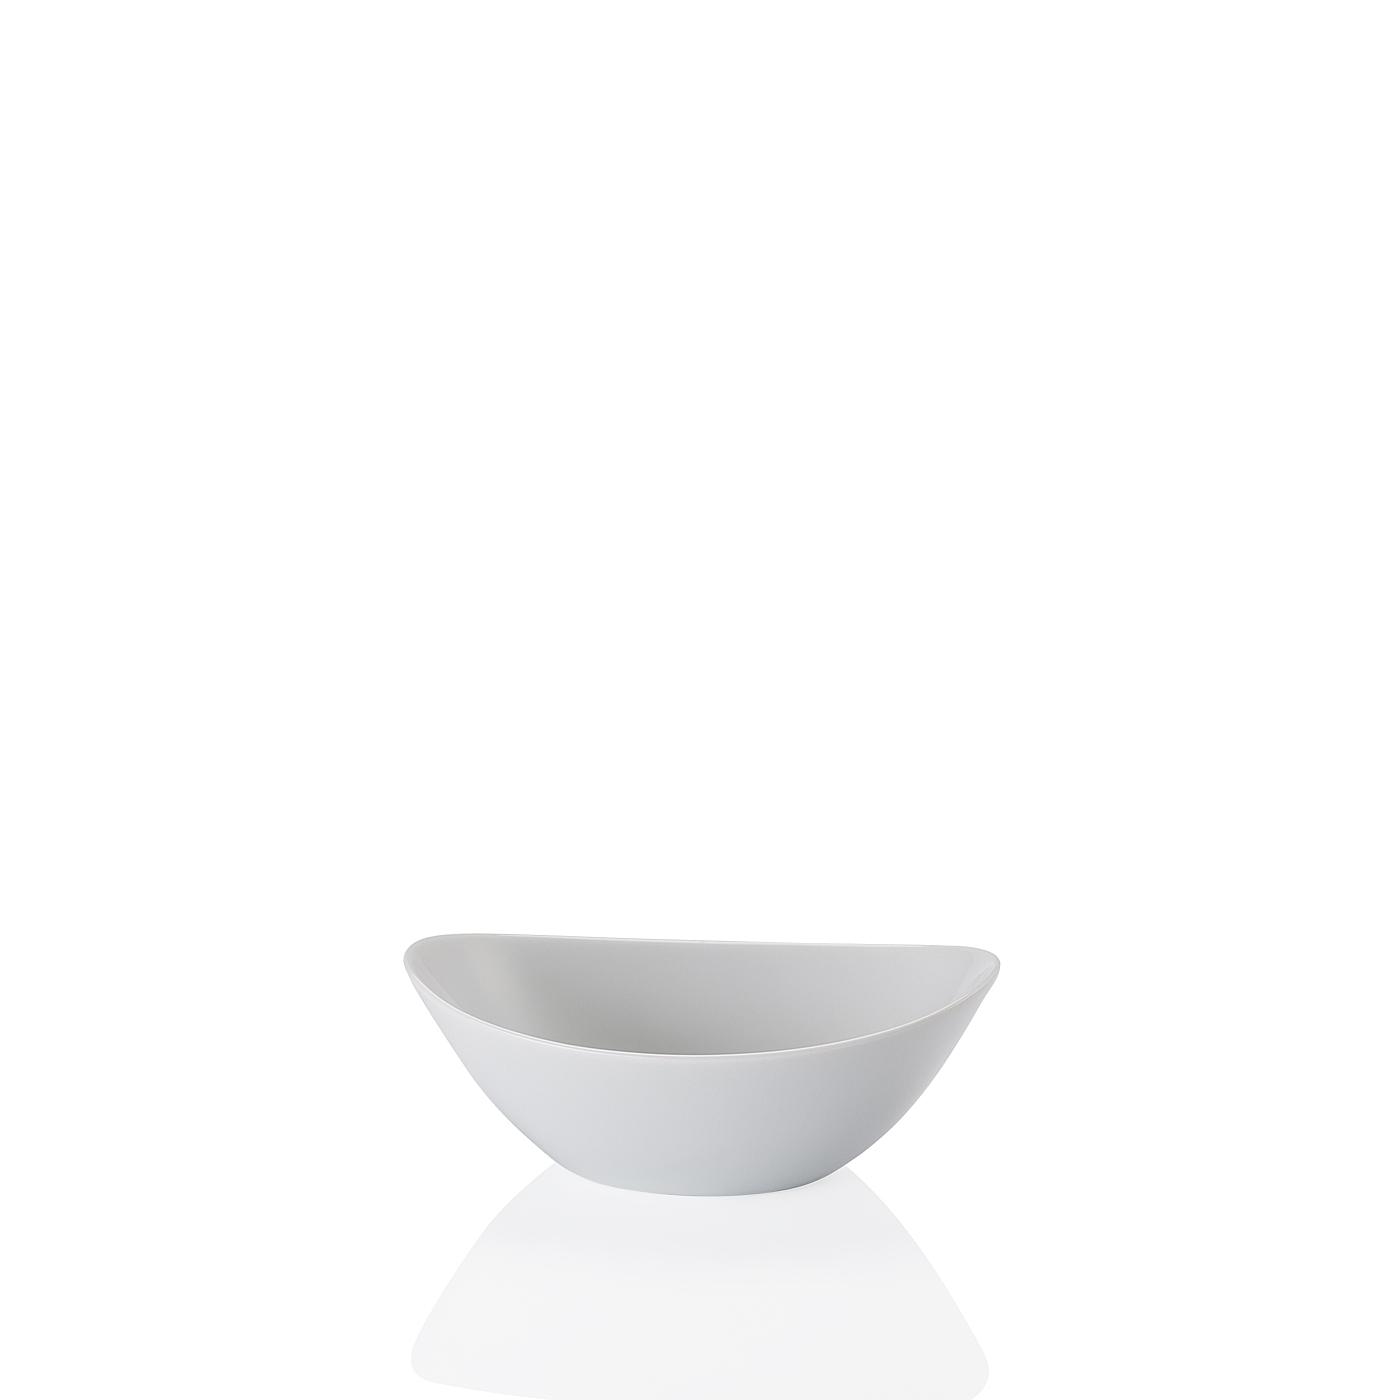 Schale oval 16 cm Form 2000 Weiss Arzberg